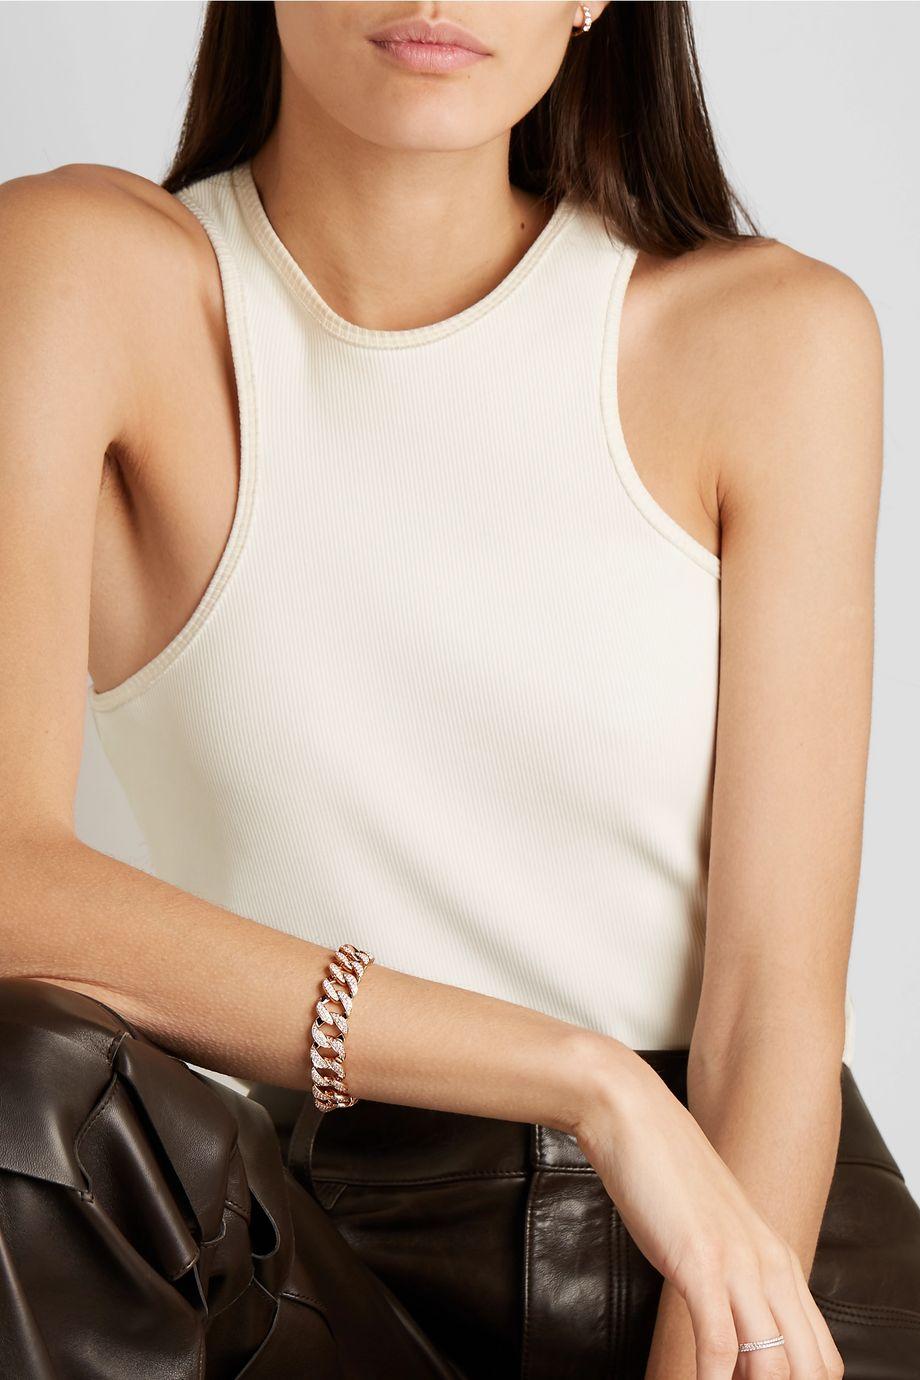 Anita Ko Armband aus 18 Karat Roségold mit Diamanten